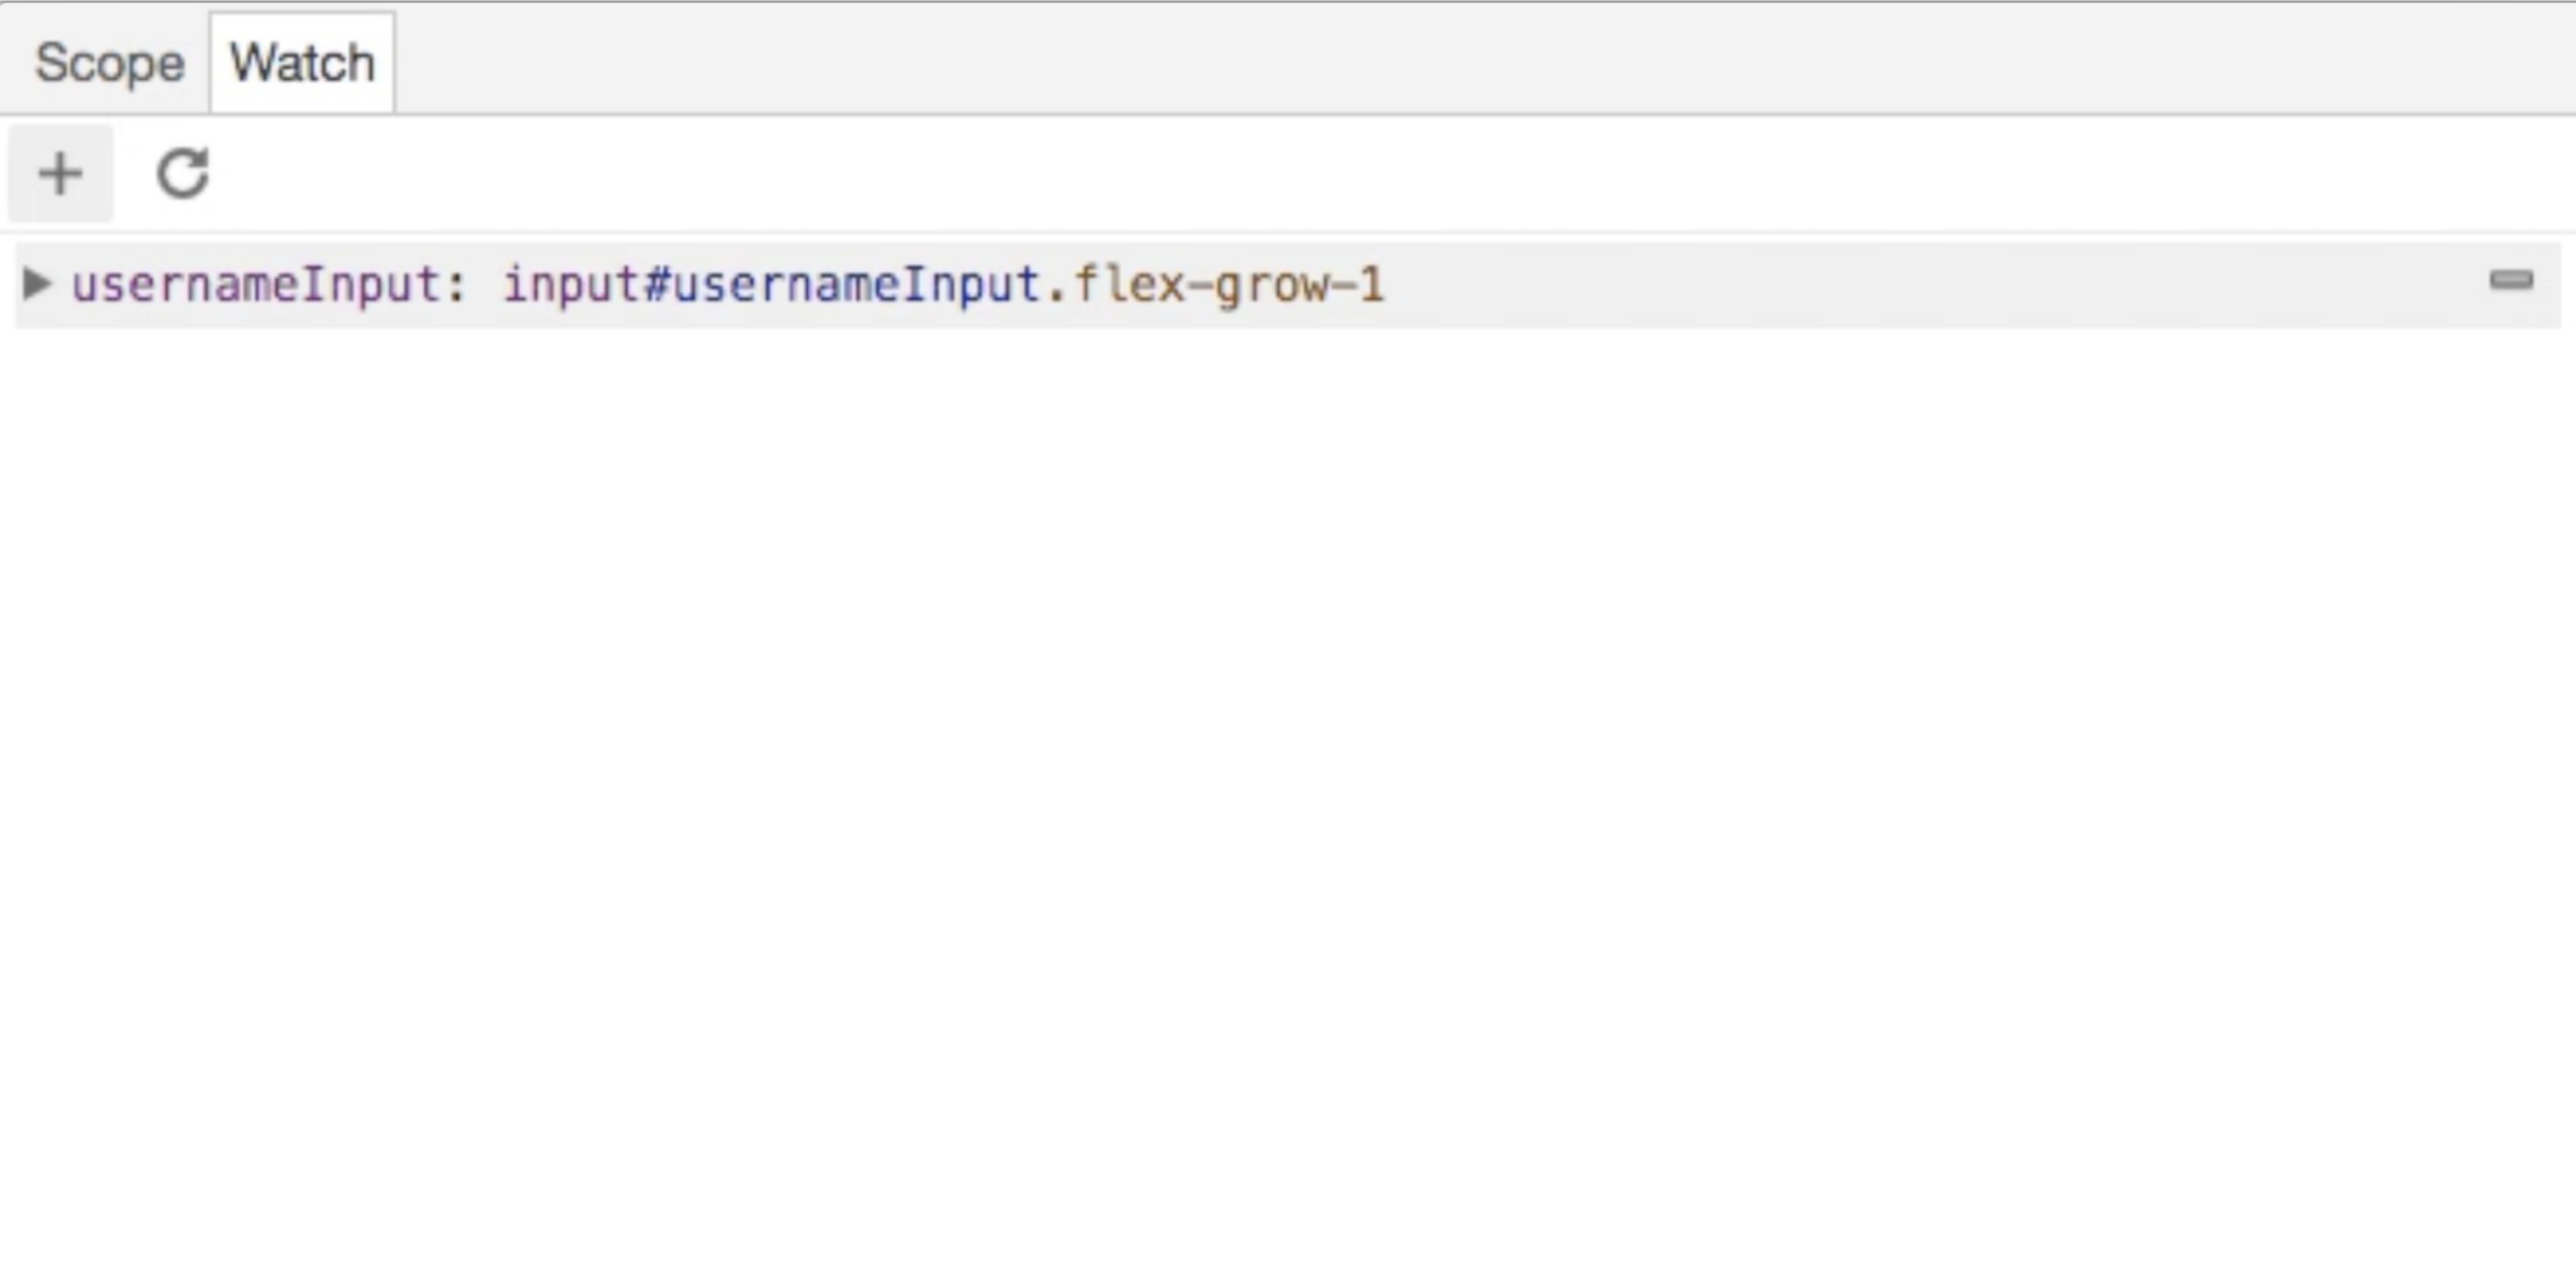 Watch tab in Chrome DevTools